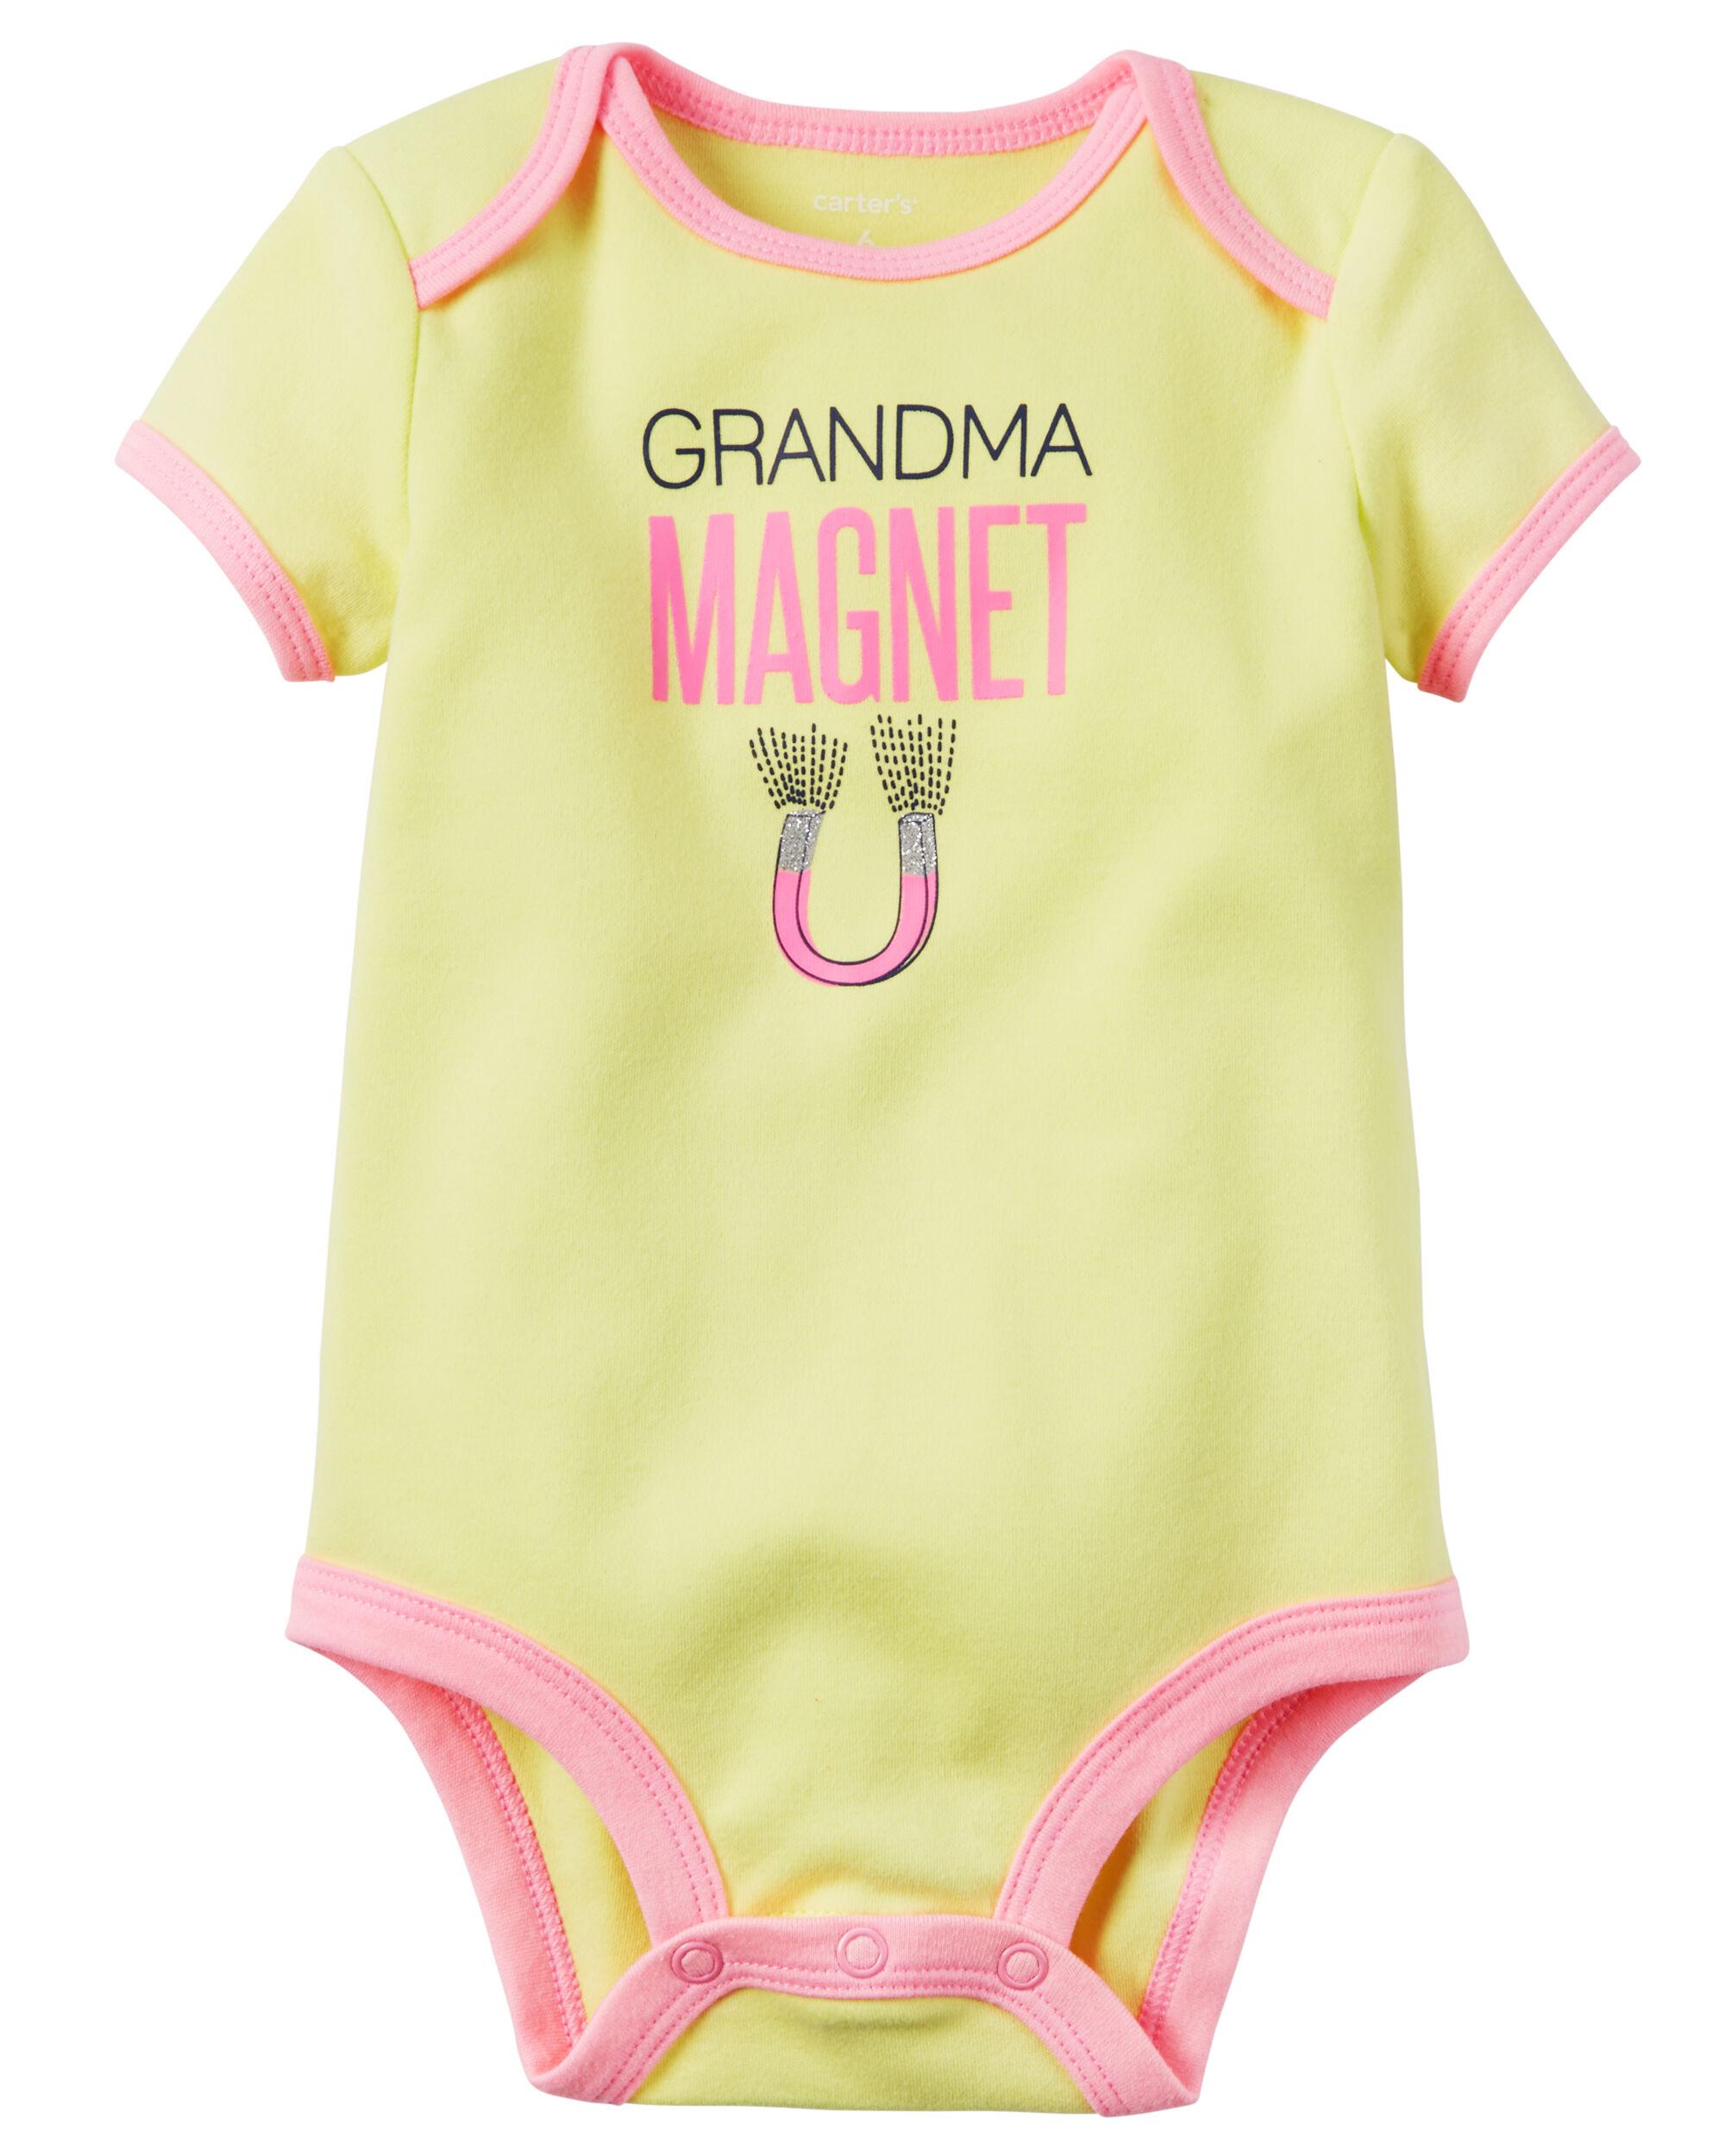 Granny Magnet Funny Girls Babygrow baby vest